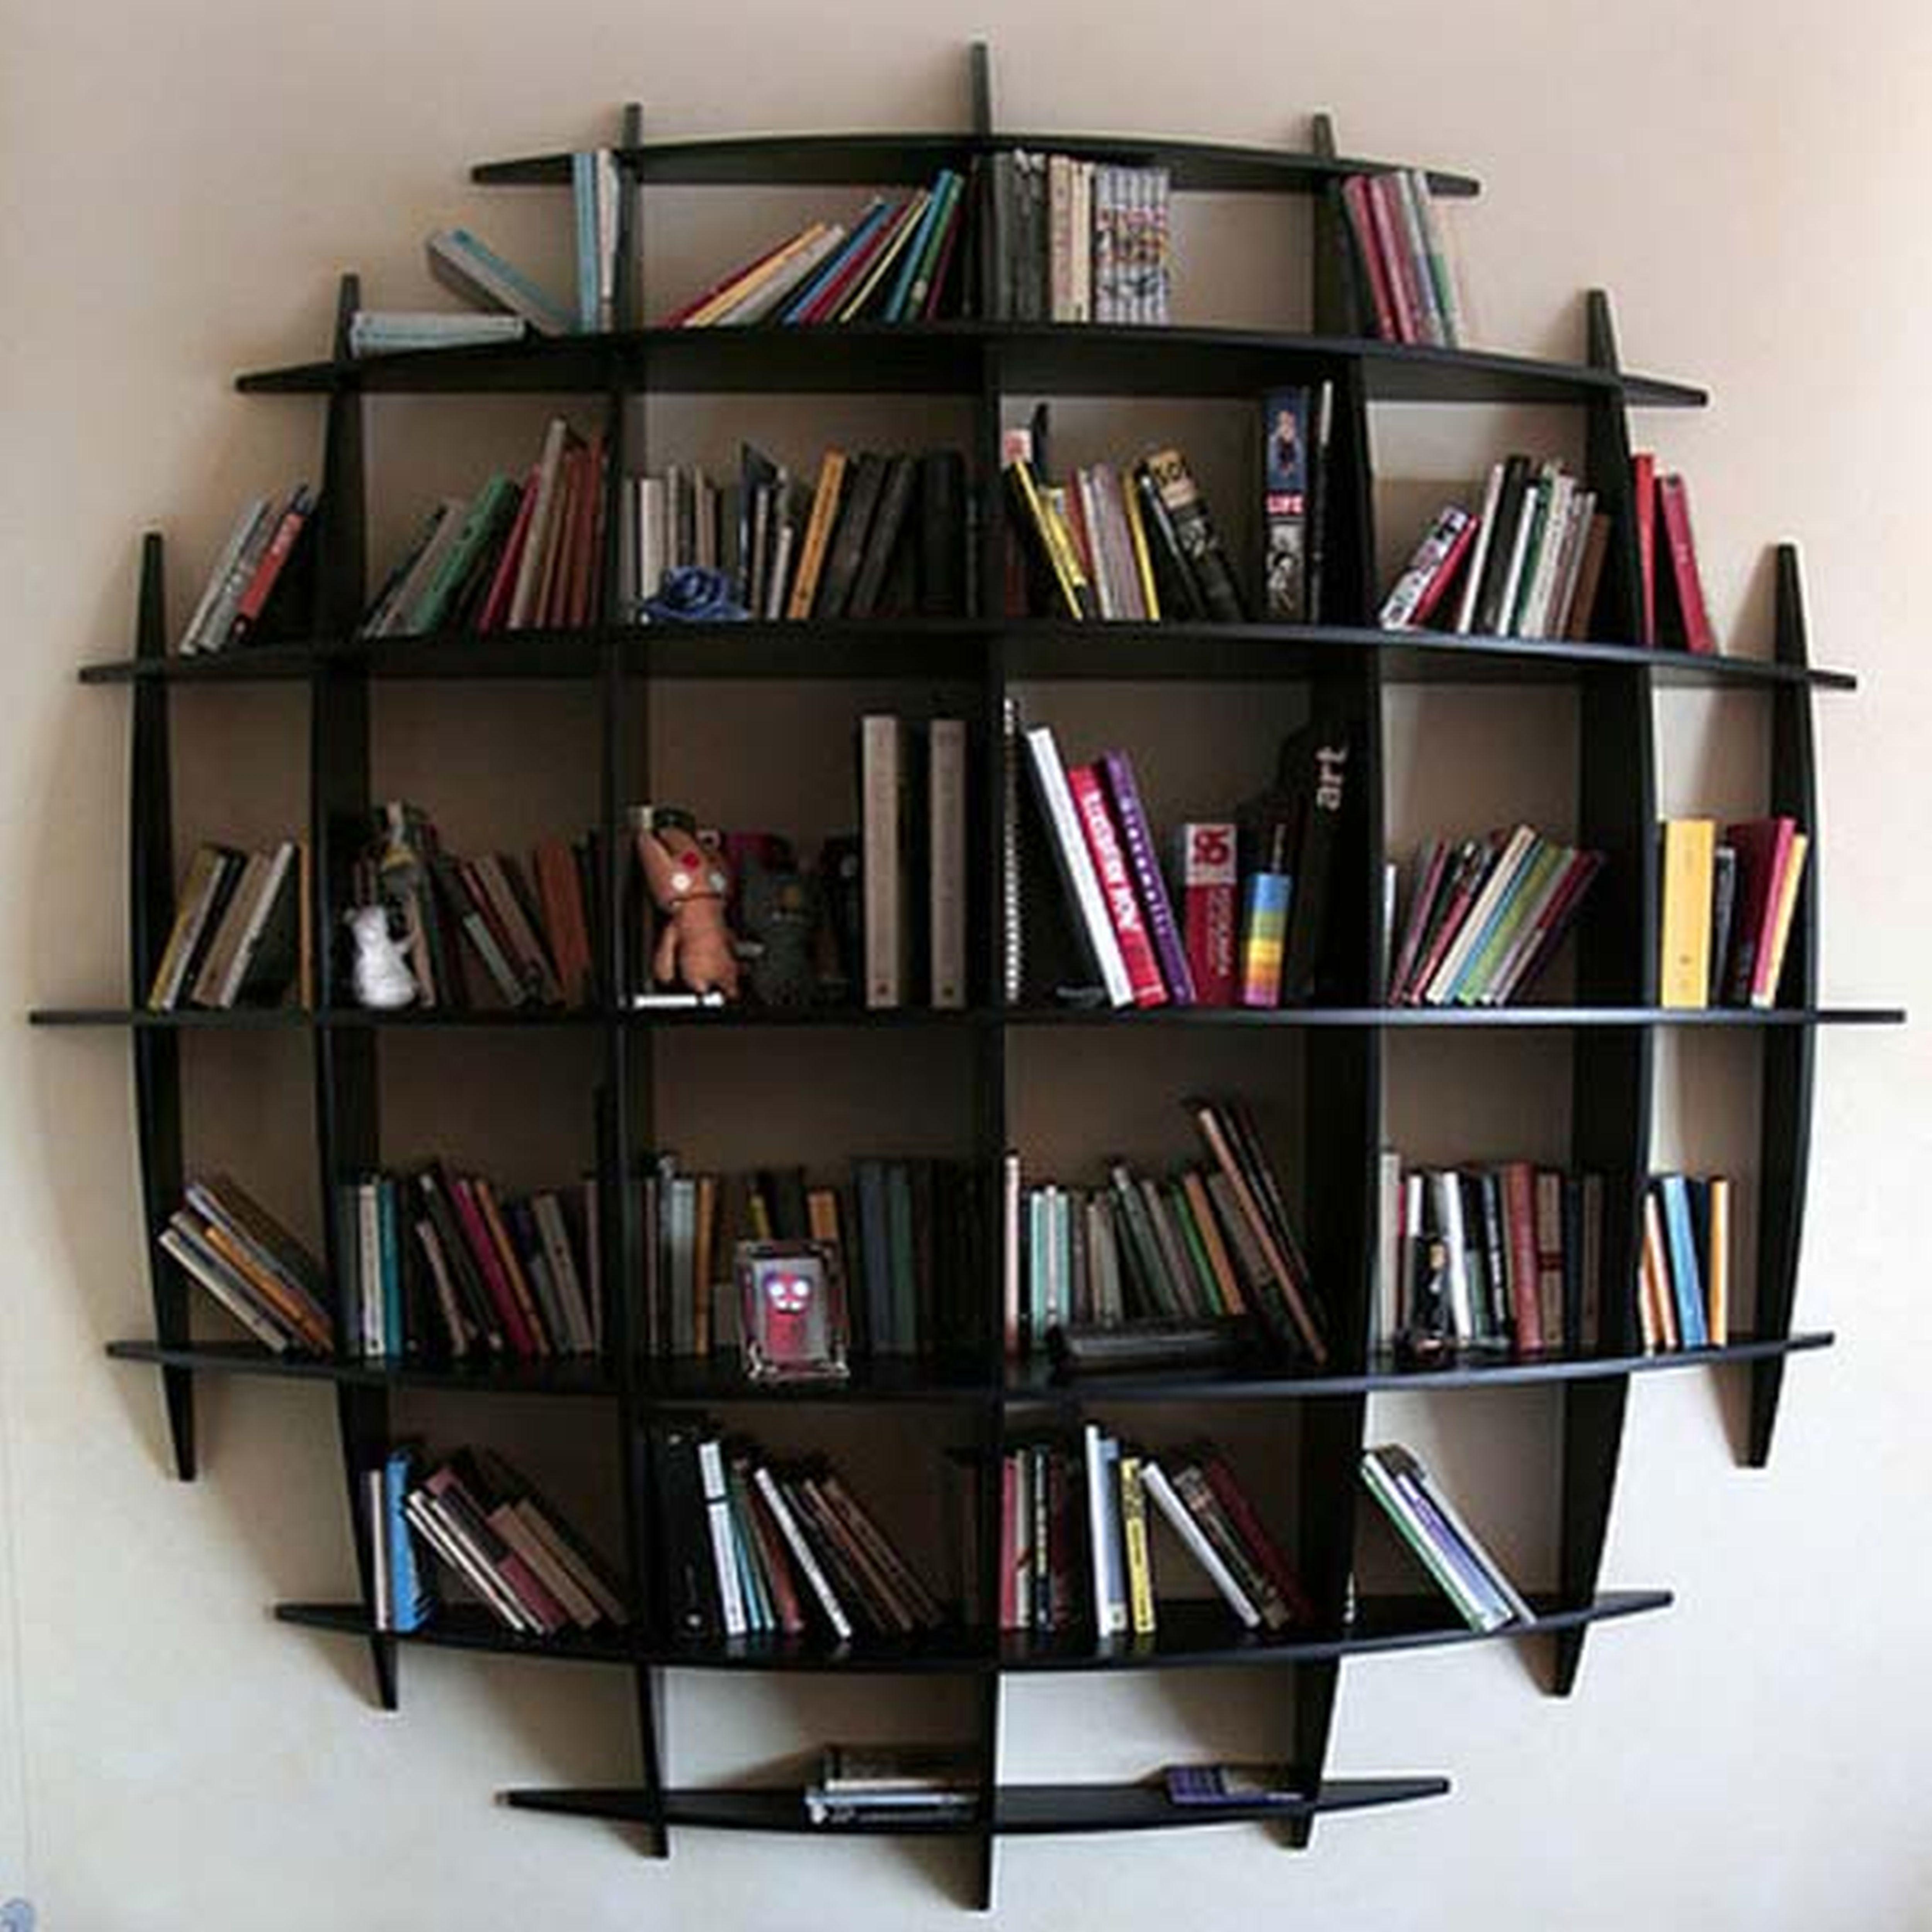 10 Bookcase Decor Ideas Blog Nana For Design A Bookcase (#1 of 15)